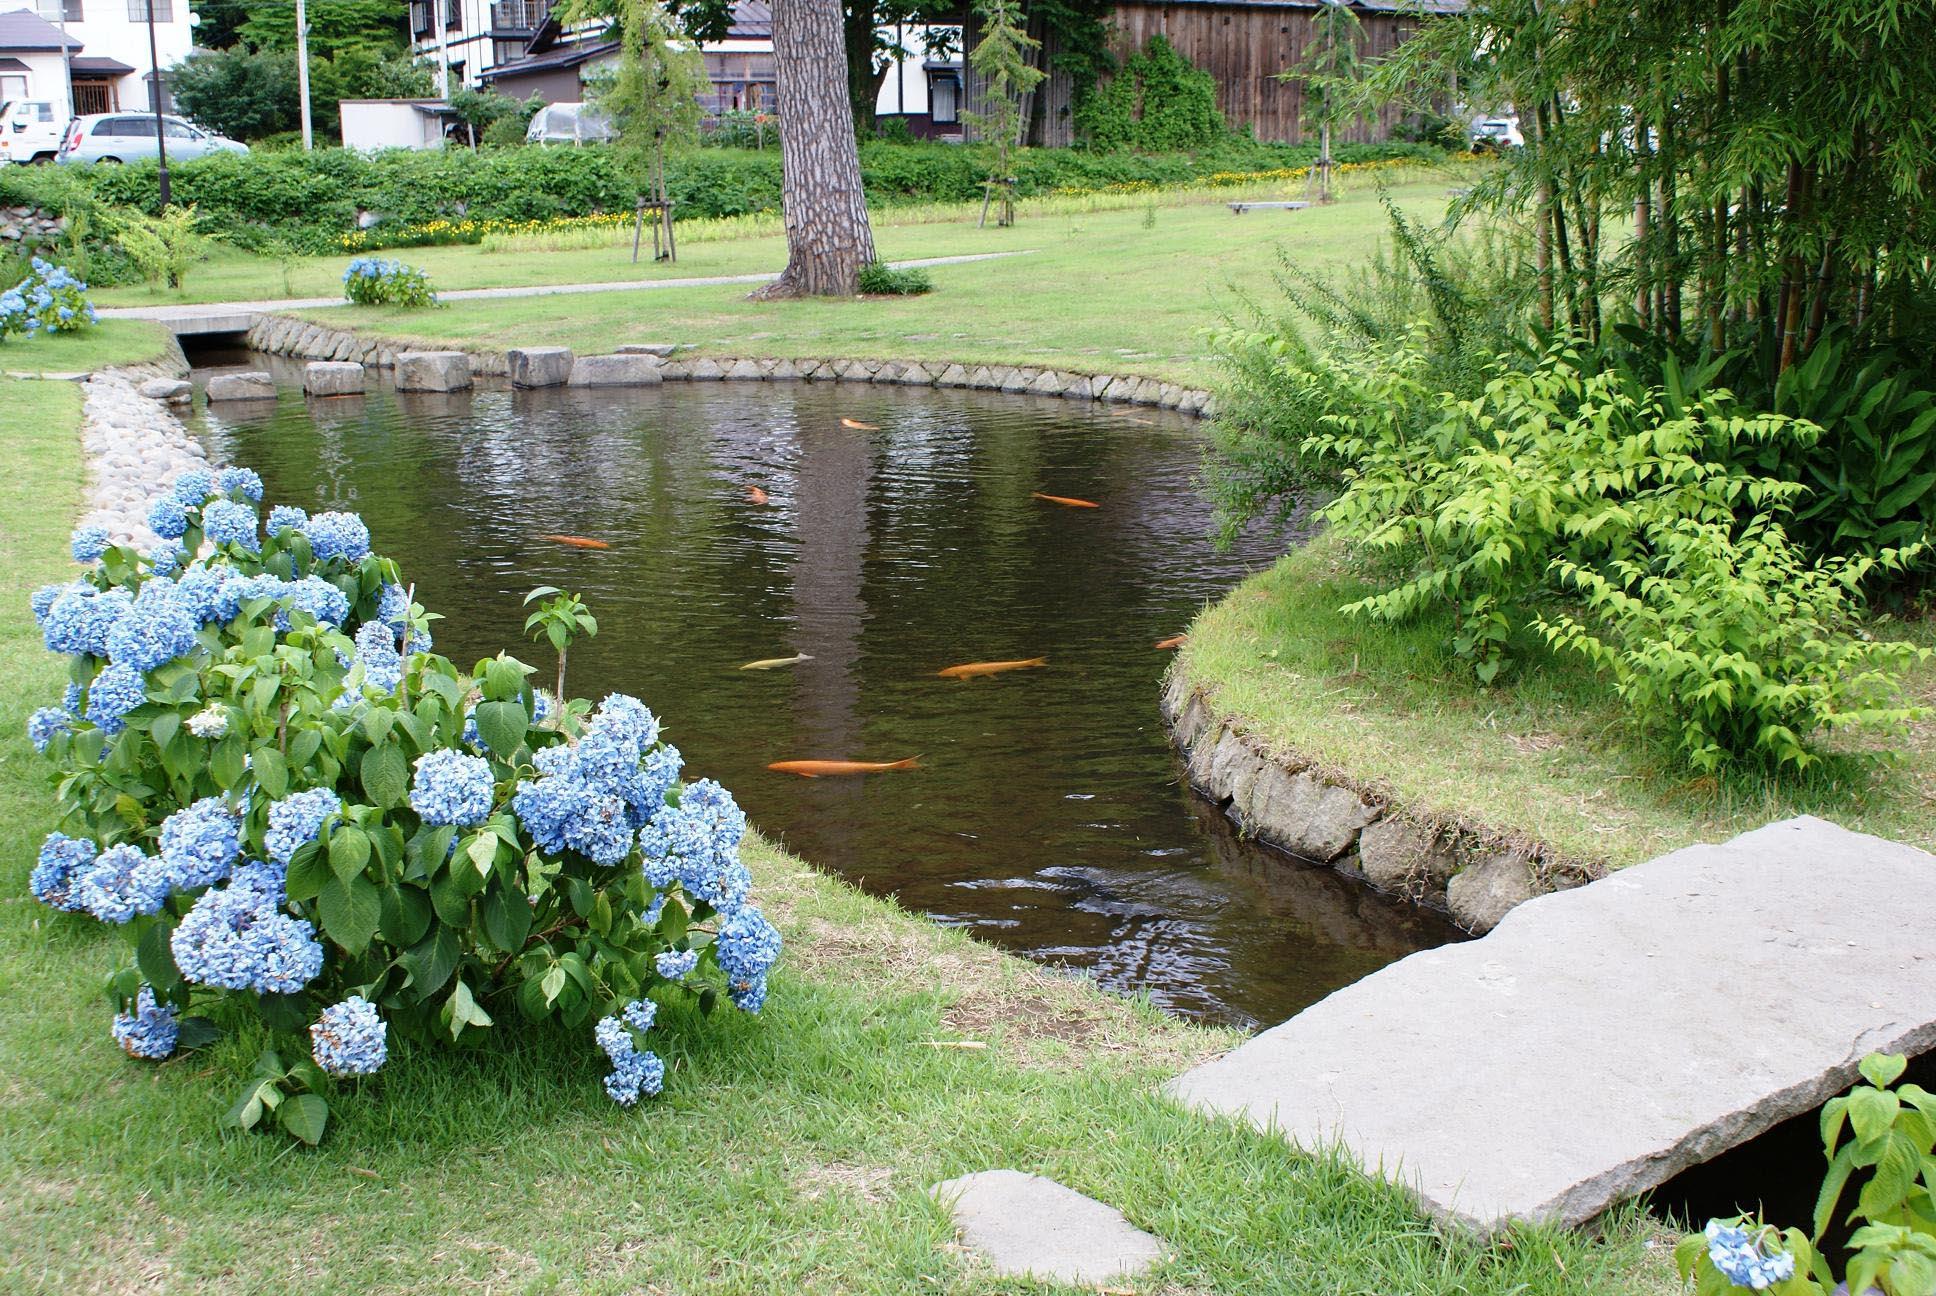 Fish Pond In Garden | Backyard Design Ideas on Backyard Koi Pond Designs  id=77368